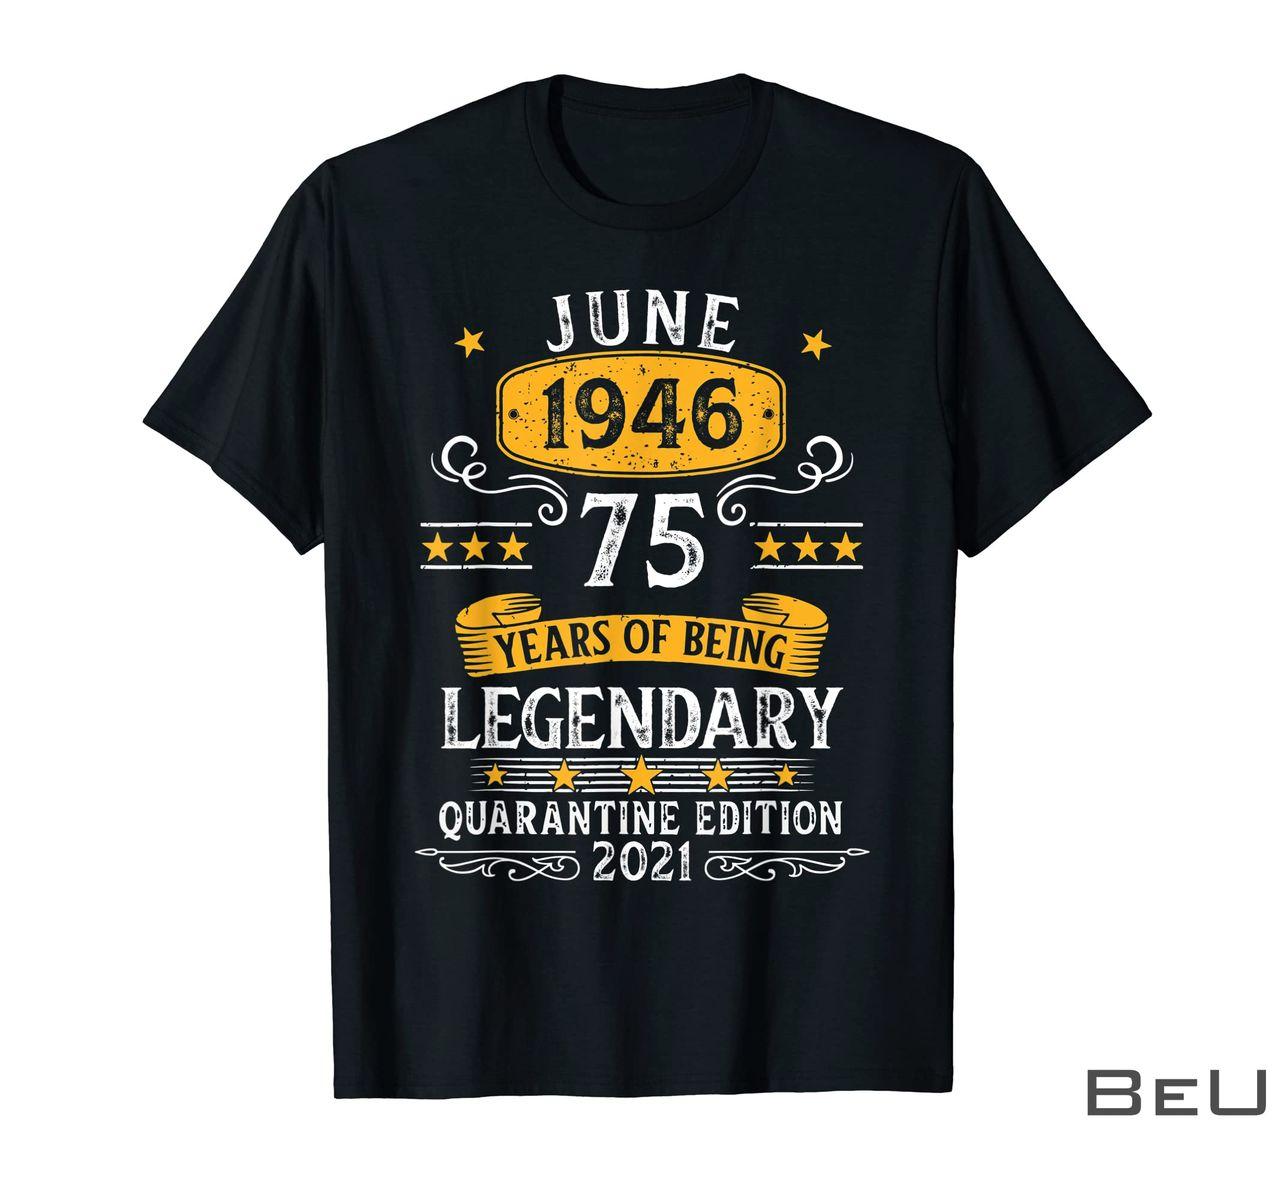 June 1946 75 Year Of Being Legendary Quarantine Edition Shirt